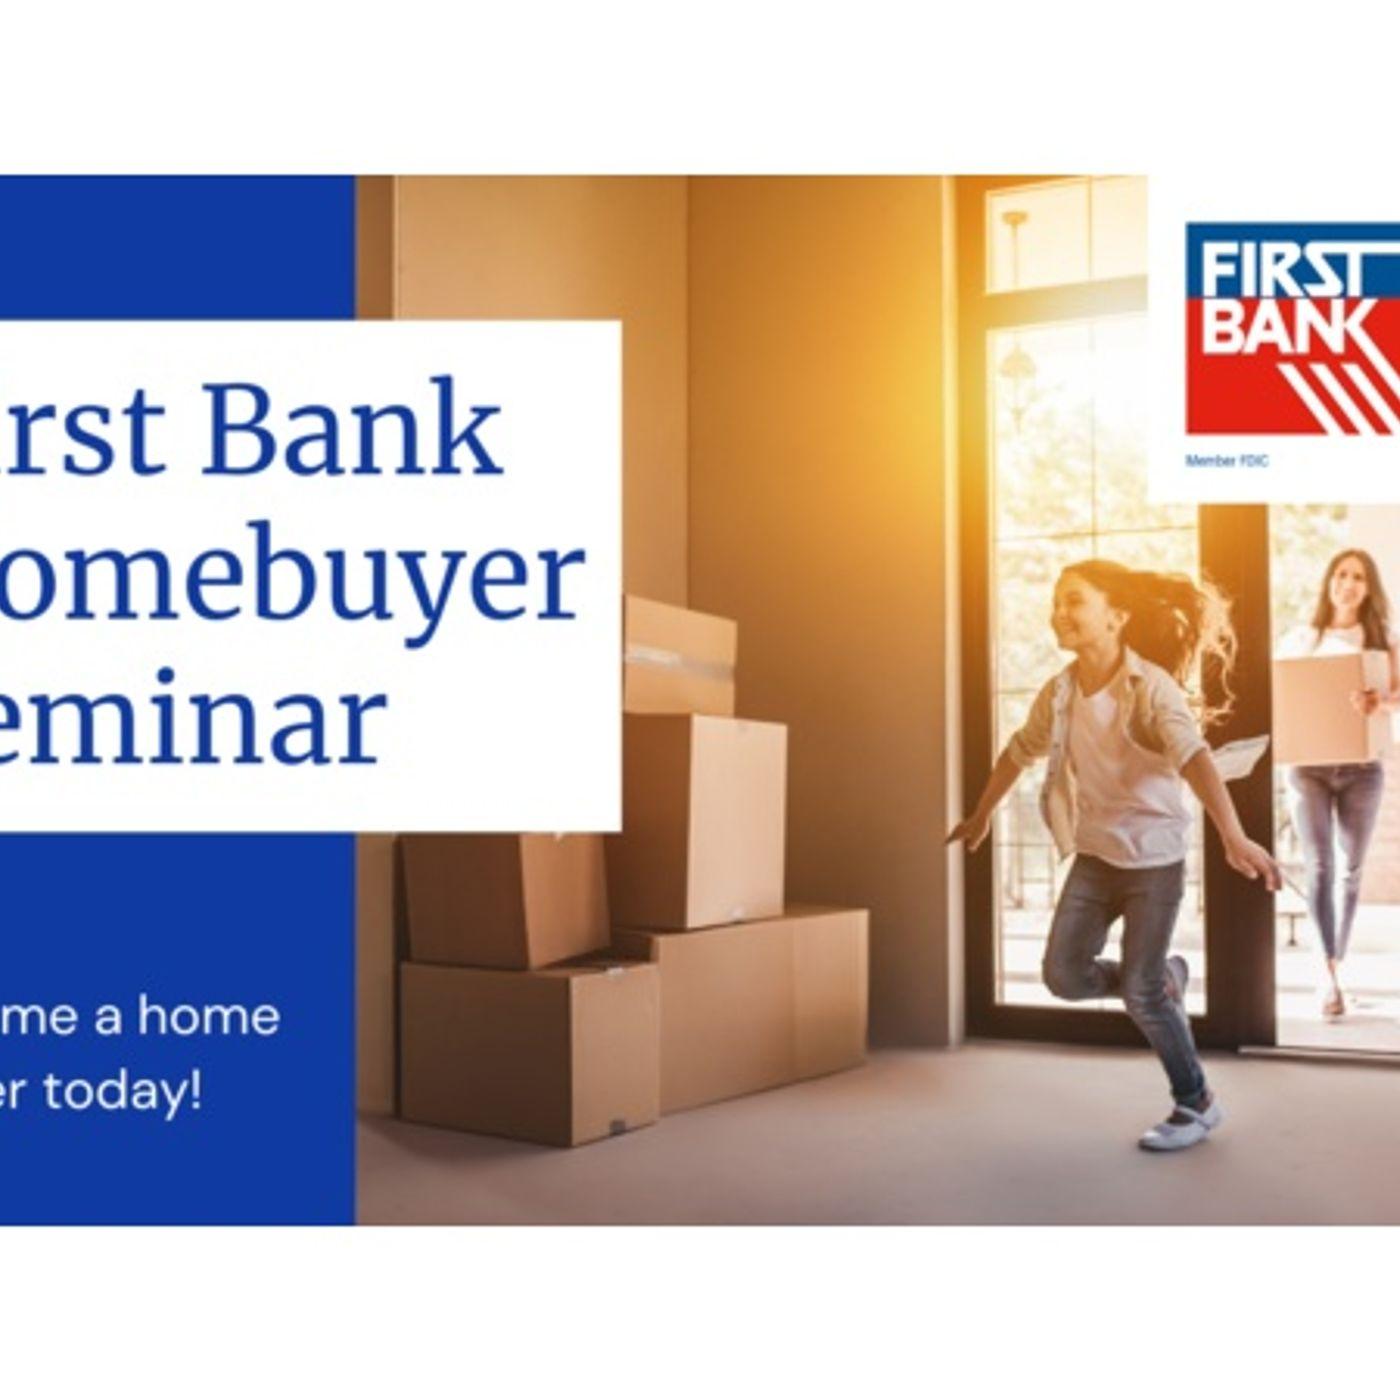 Homebuyer Seminar: First Bank, April 10, 2021